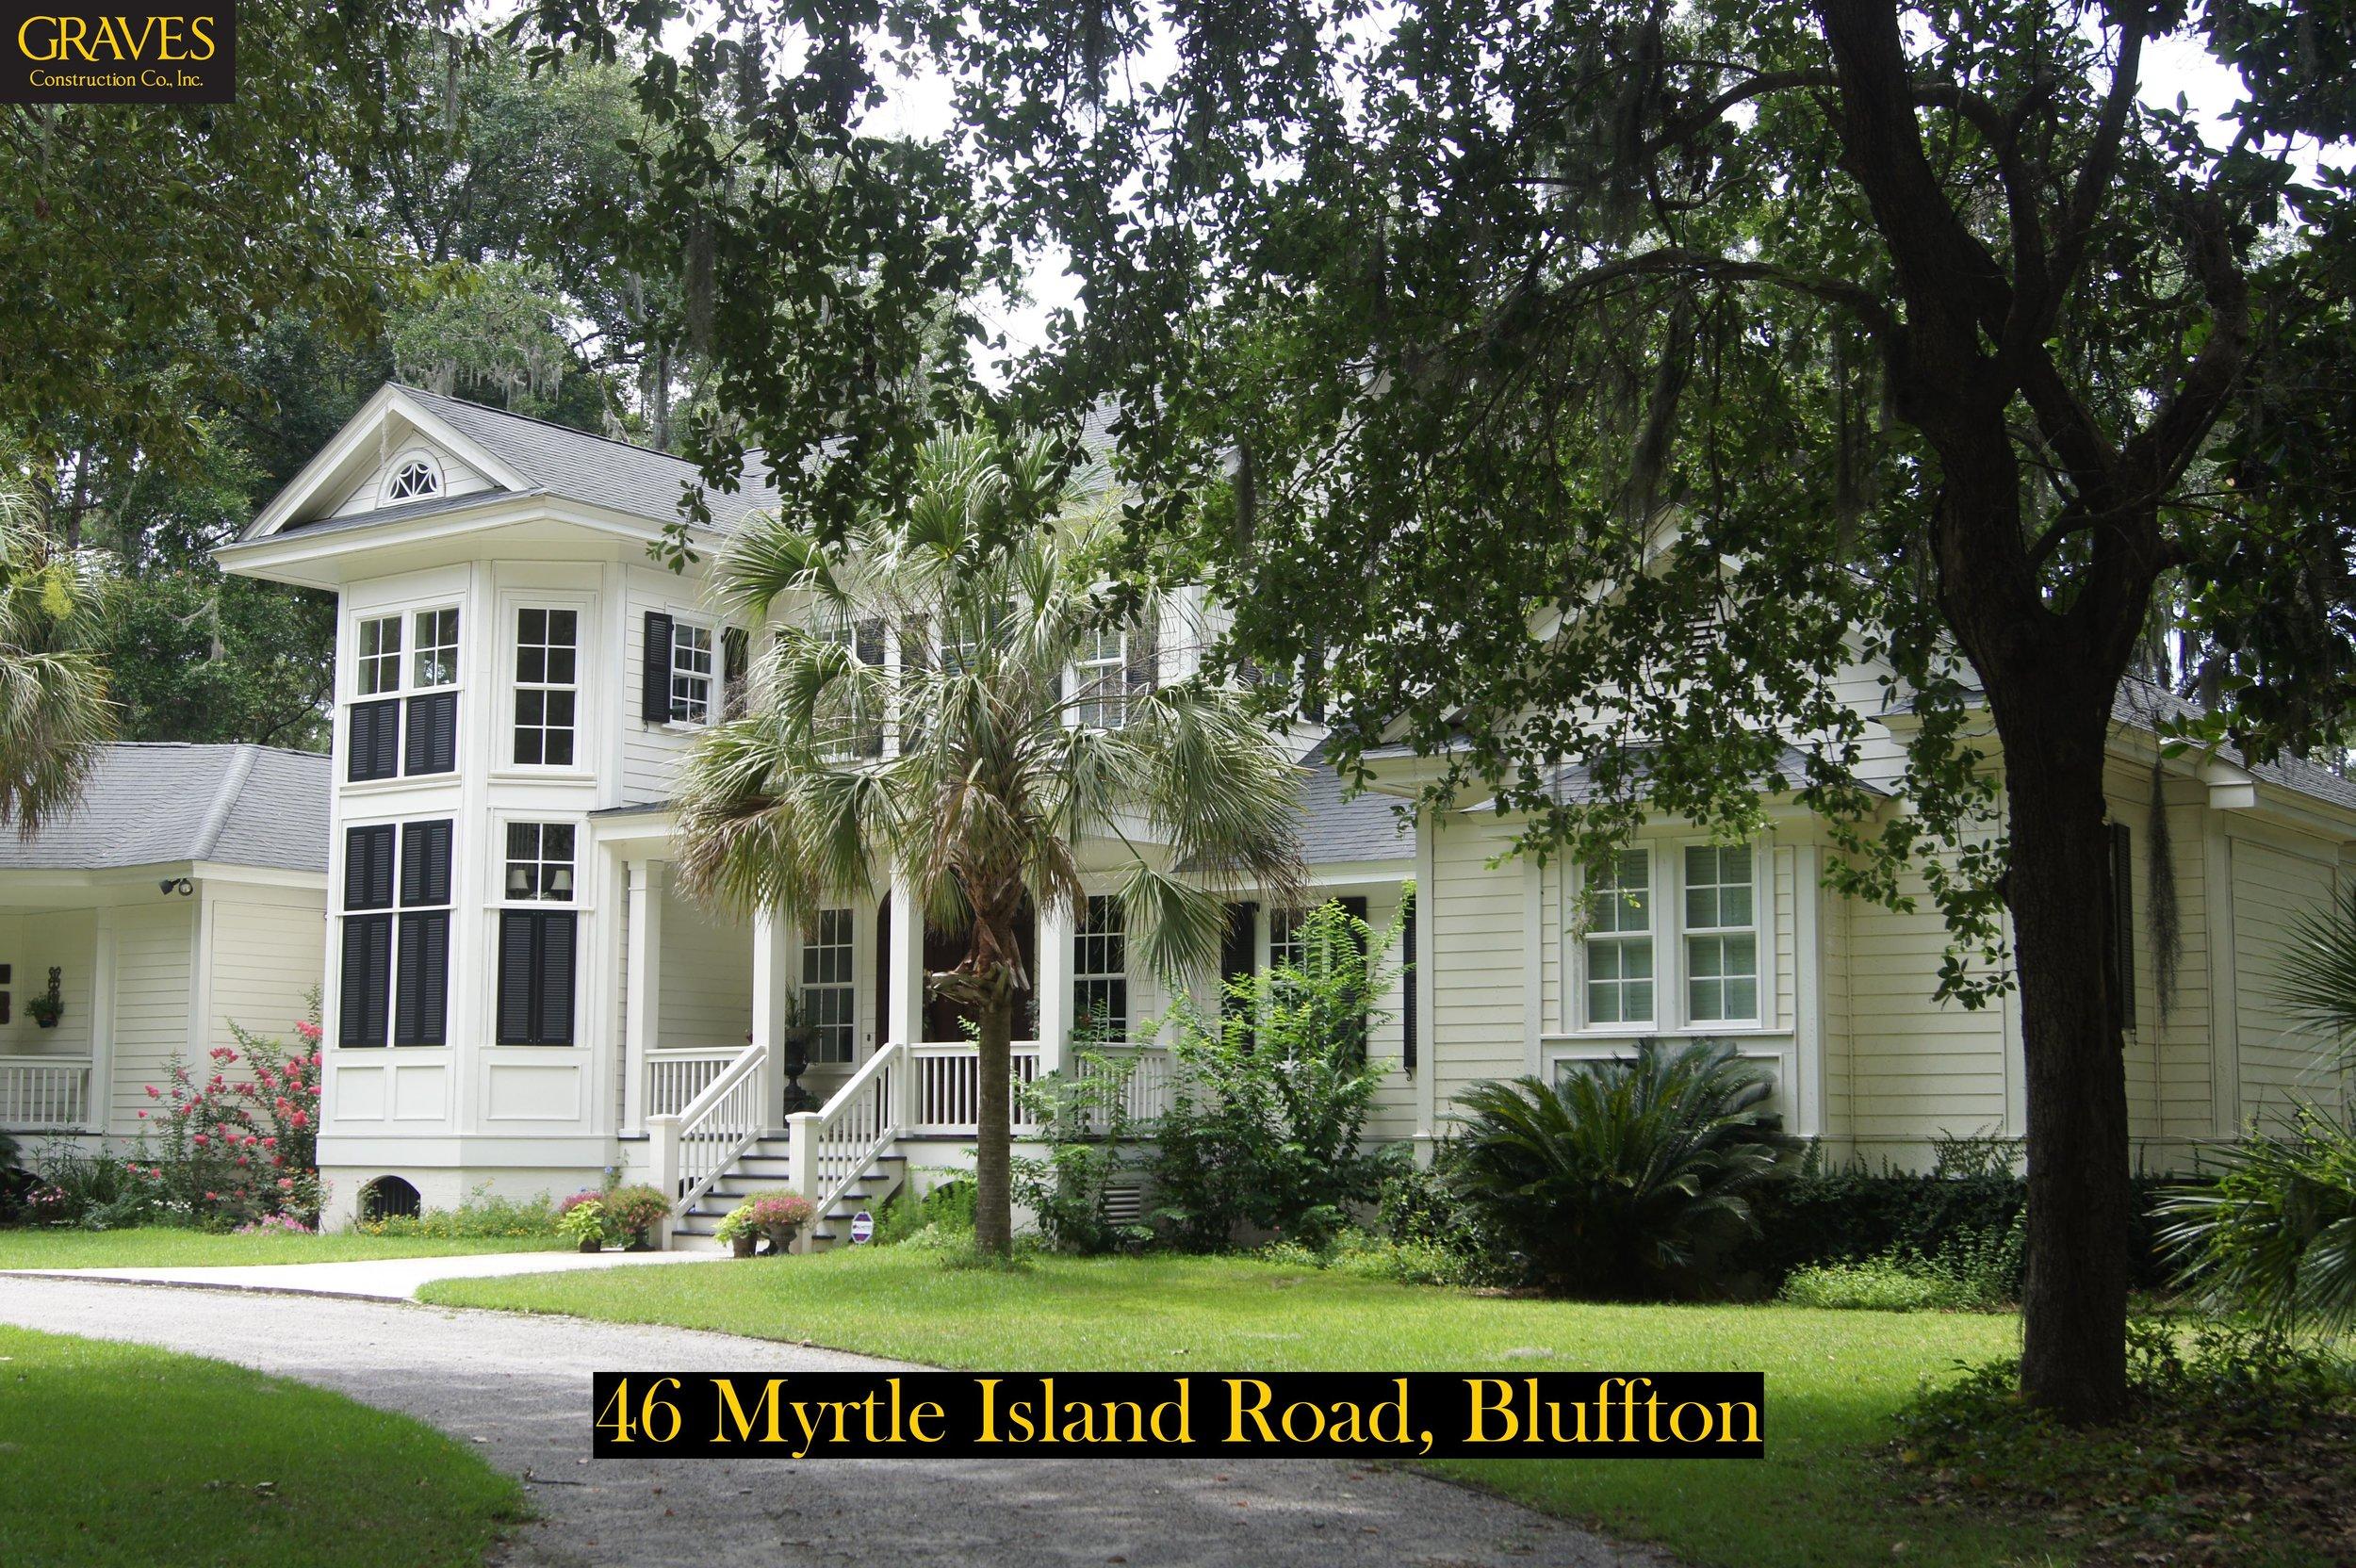 46 Myrtle Island - 2